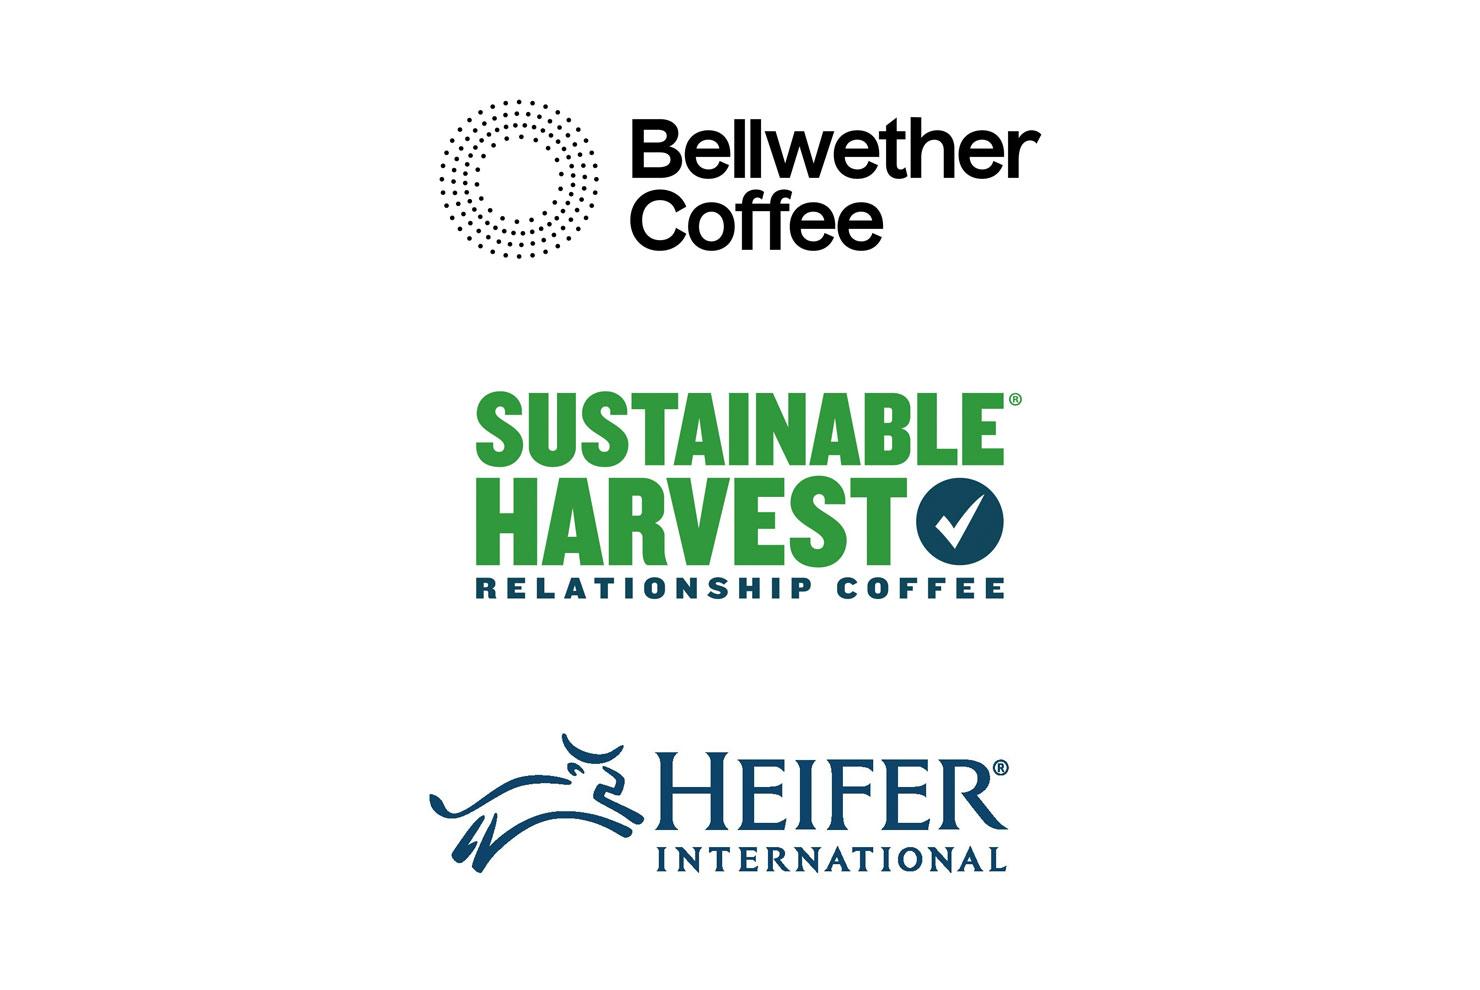 bellwether_sustainable_heifer_logos